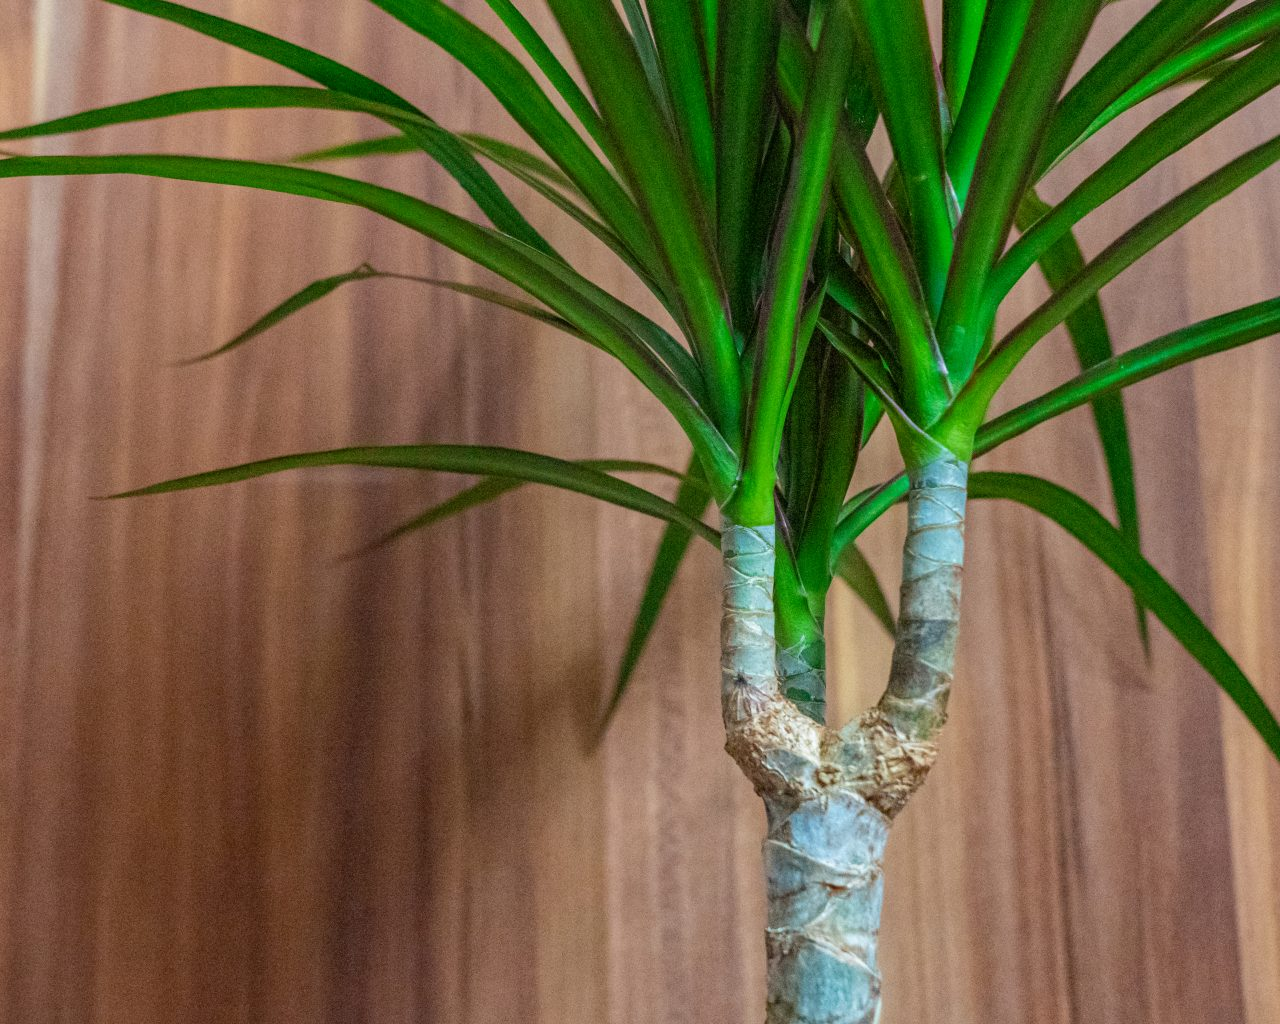 Dracaena-makkelijke-kamerplanten-weinig-water